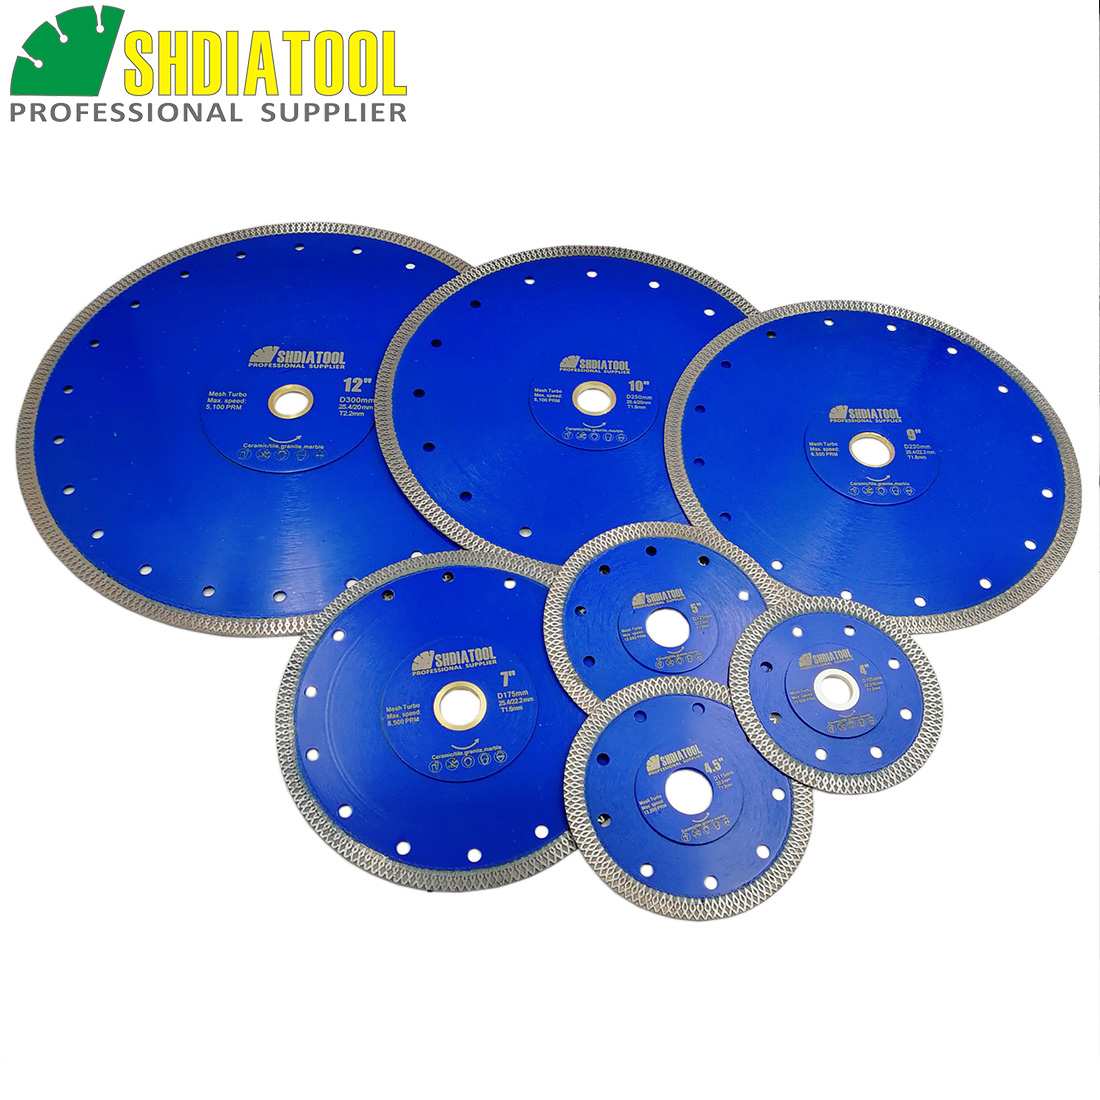 SHDIATOOL 2pcs Diamond Cutting Disc X Mesh Turbo Rim Segment Dia 4